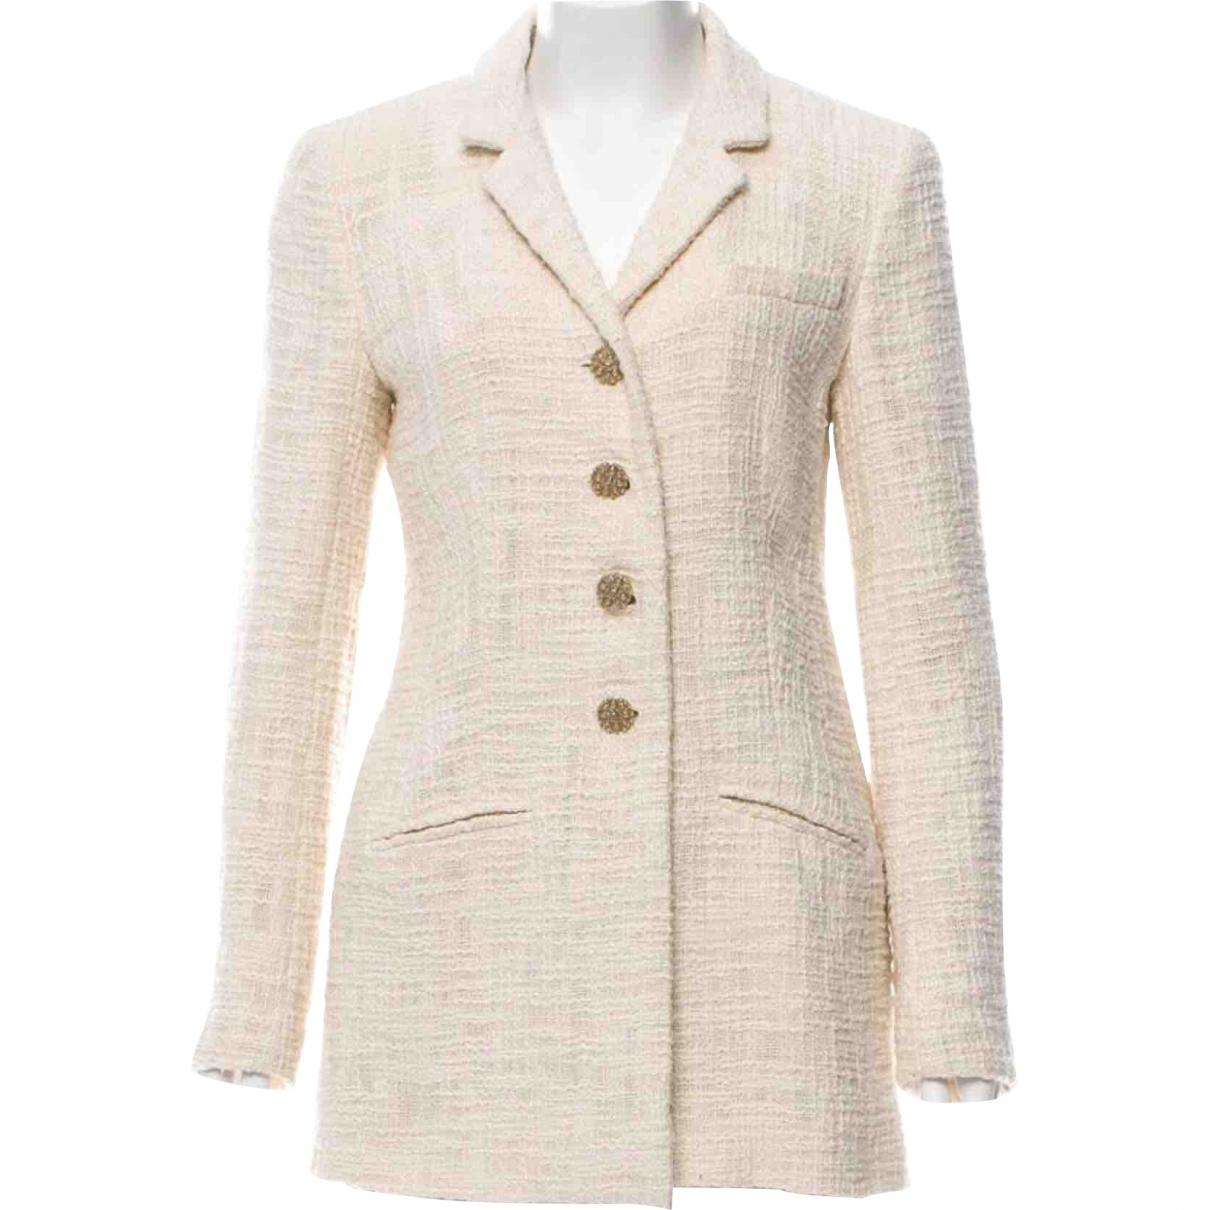 Chanel \N Ecru Cotton jacket for Women 46 FR